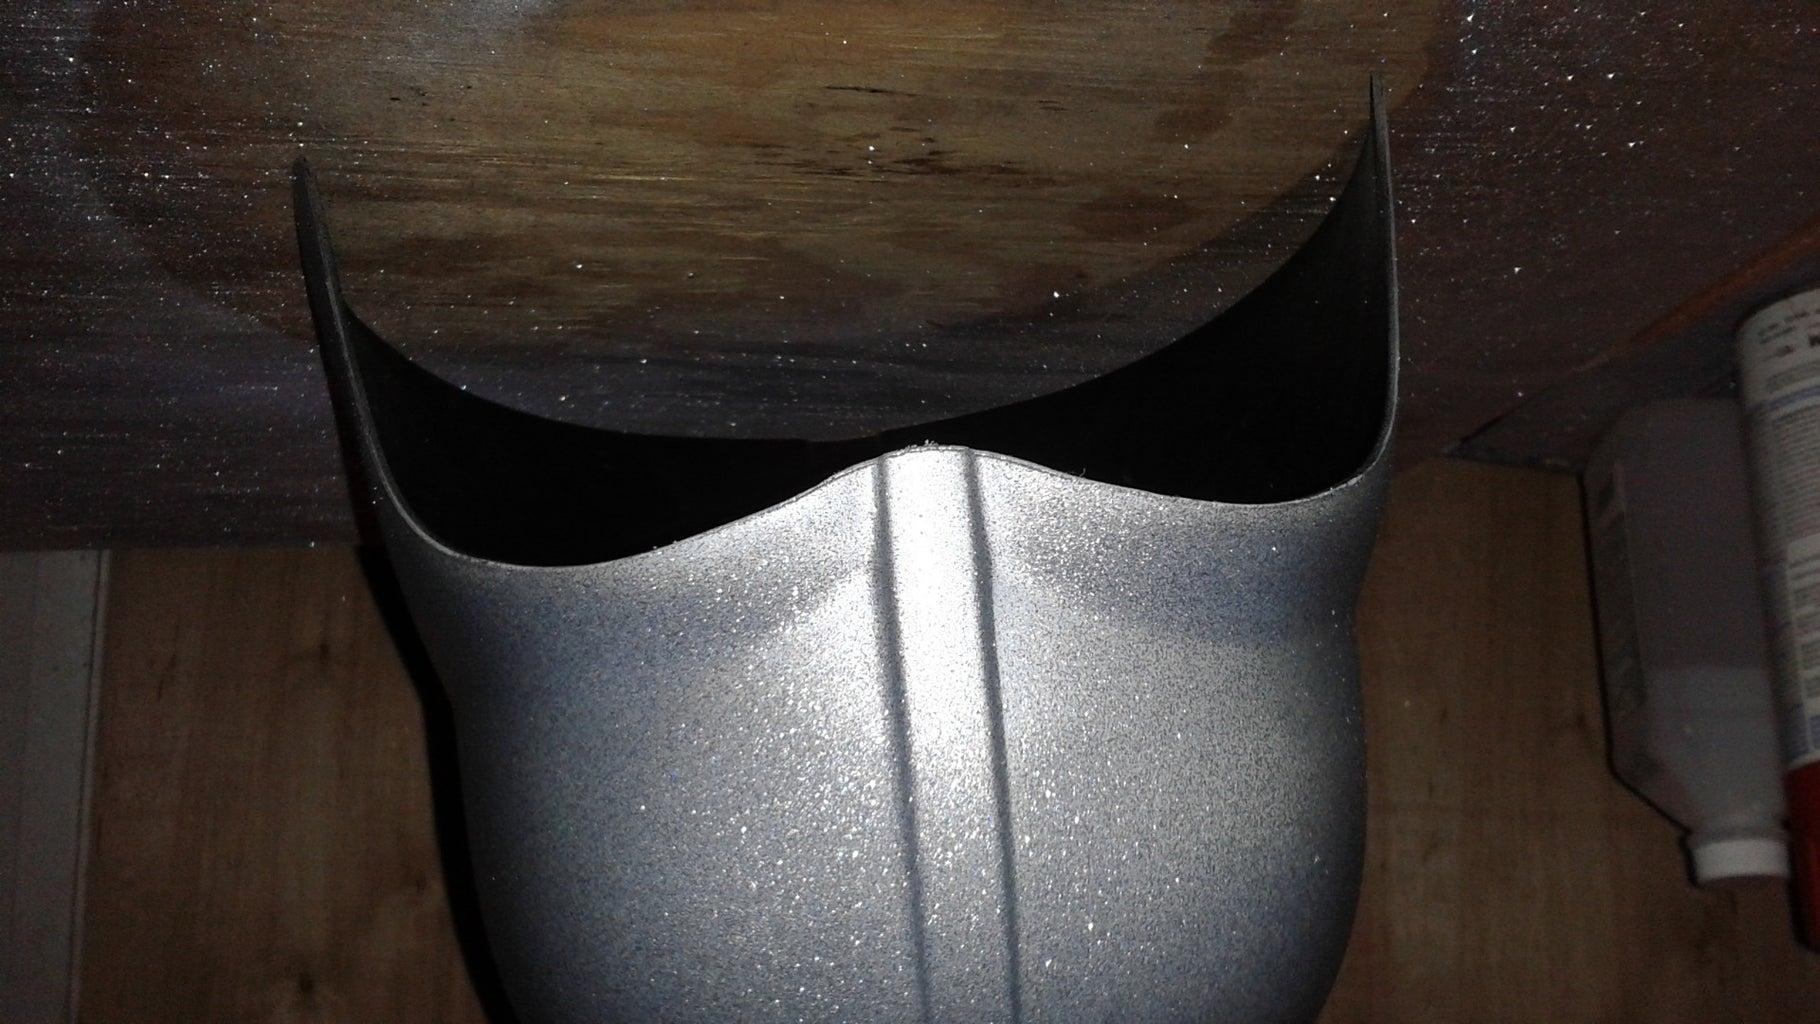 Painting the Helmet